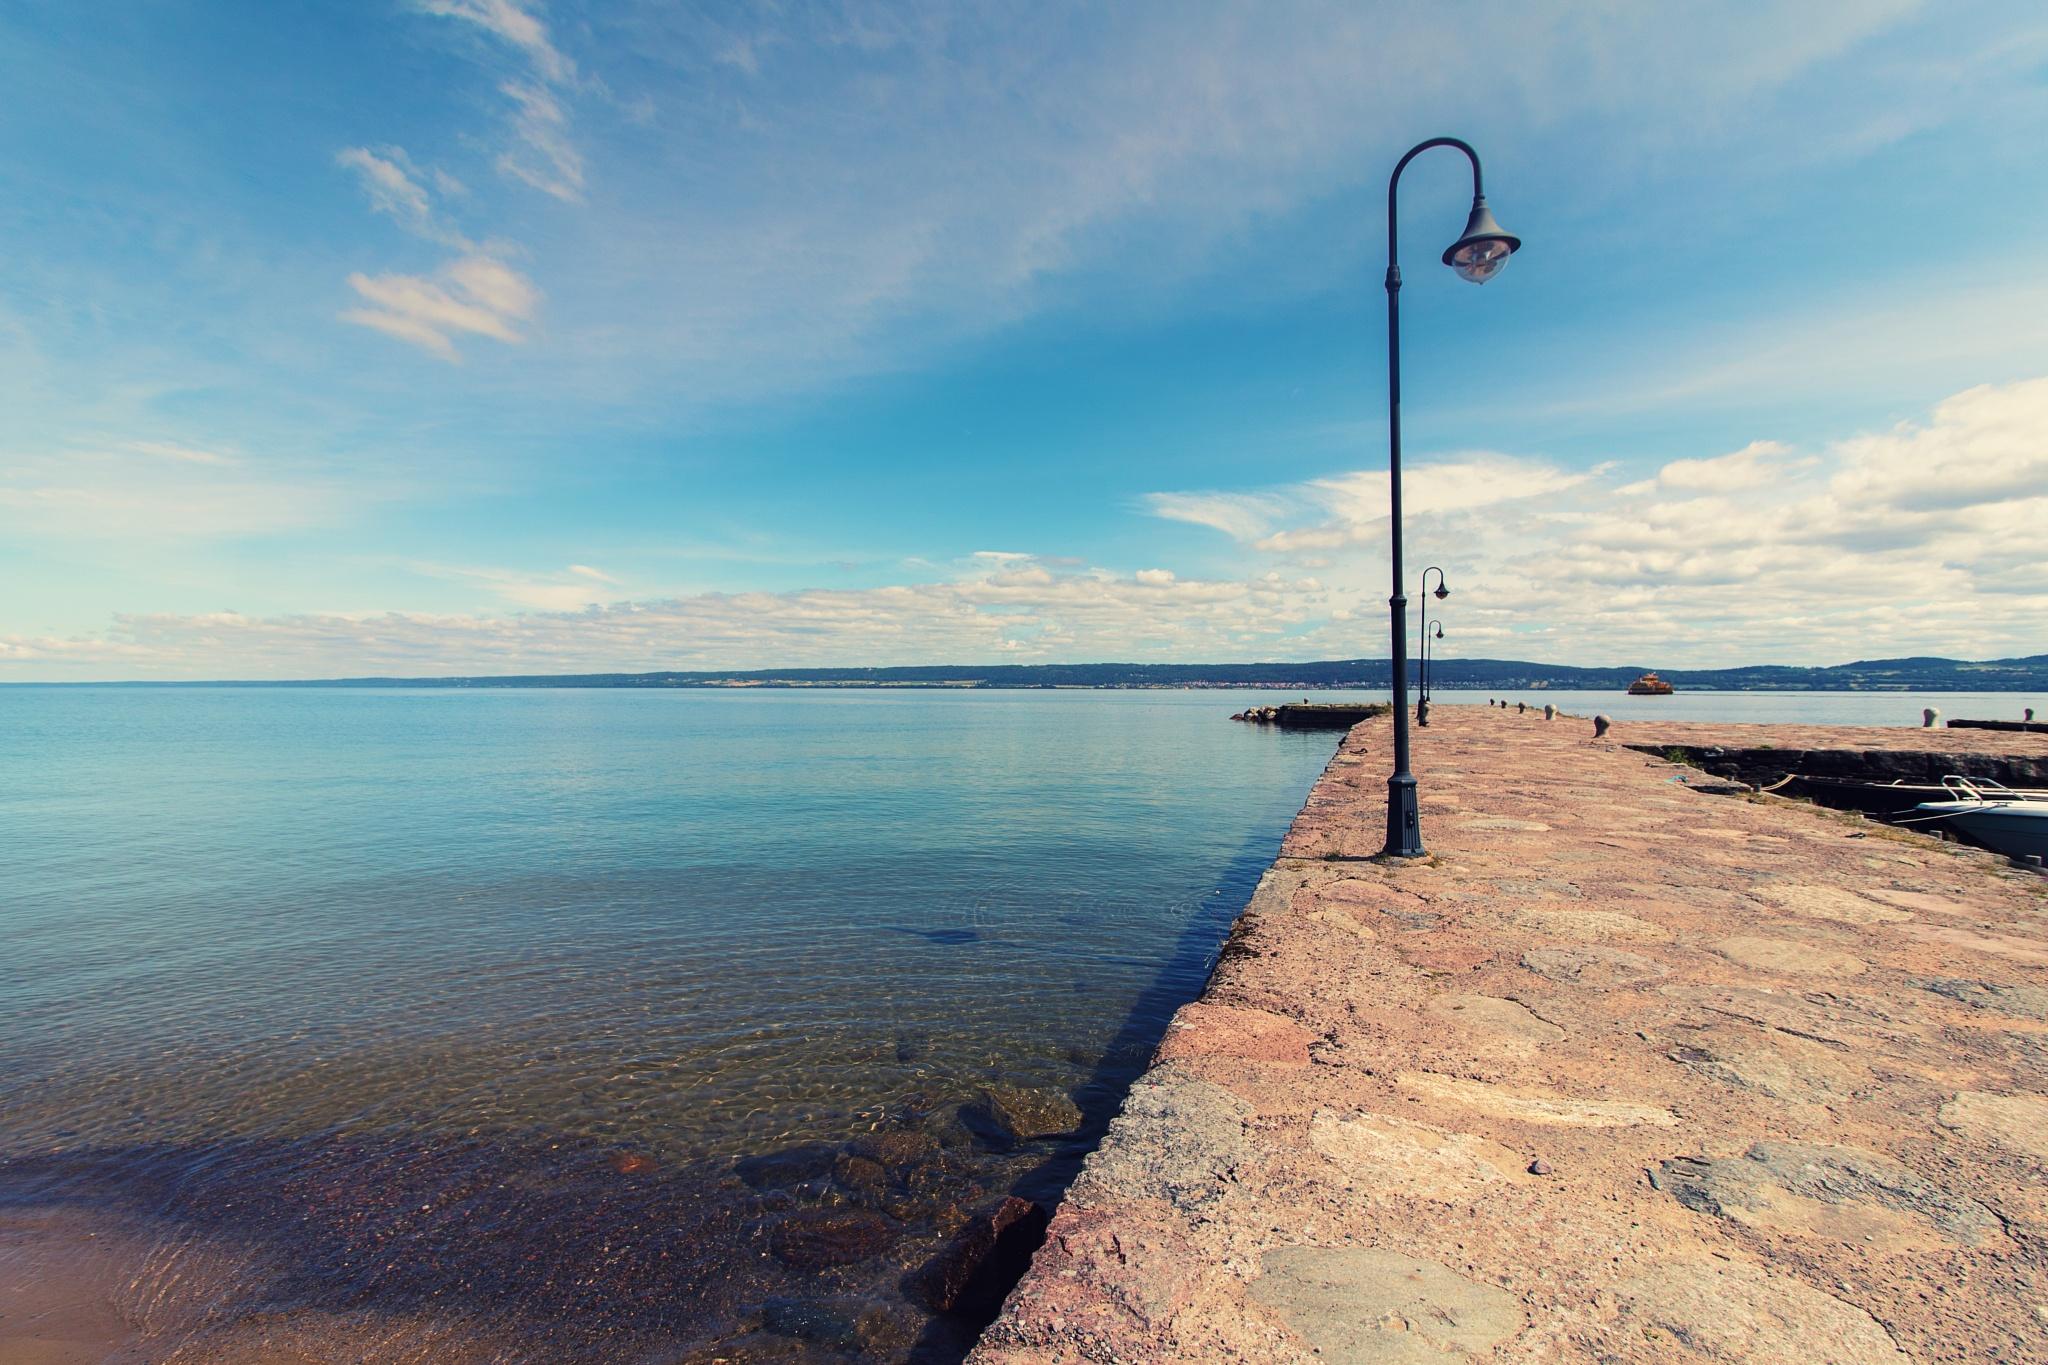 on the island Visingsö by zdenka.photo